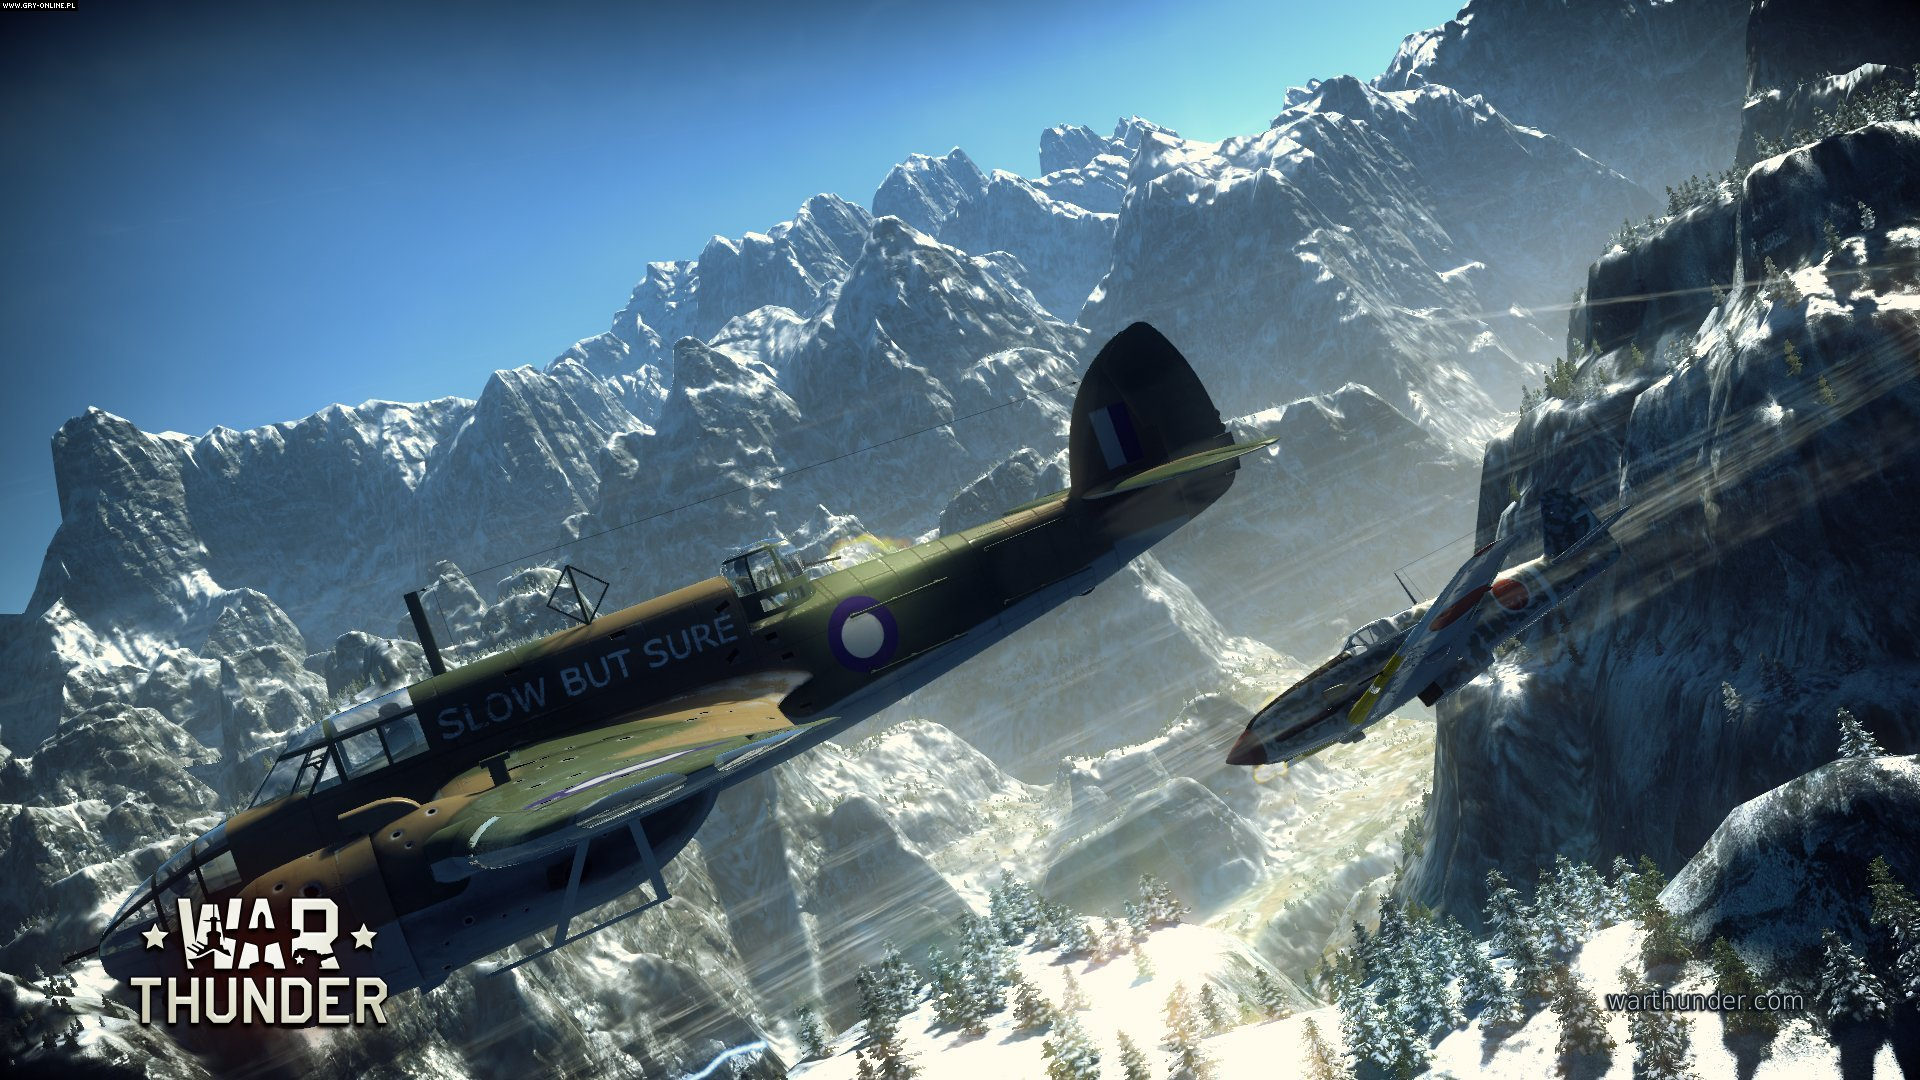 War thunder gameplay pc hd images